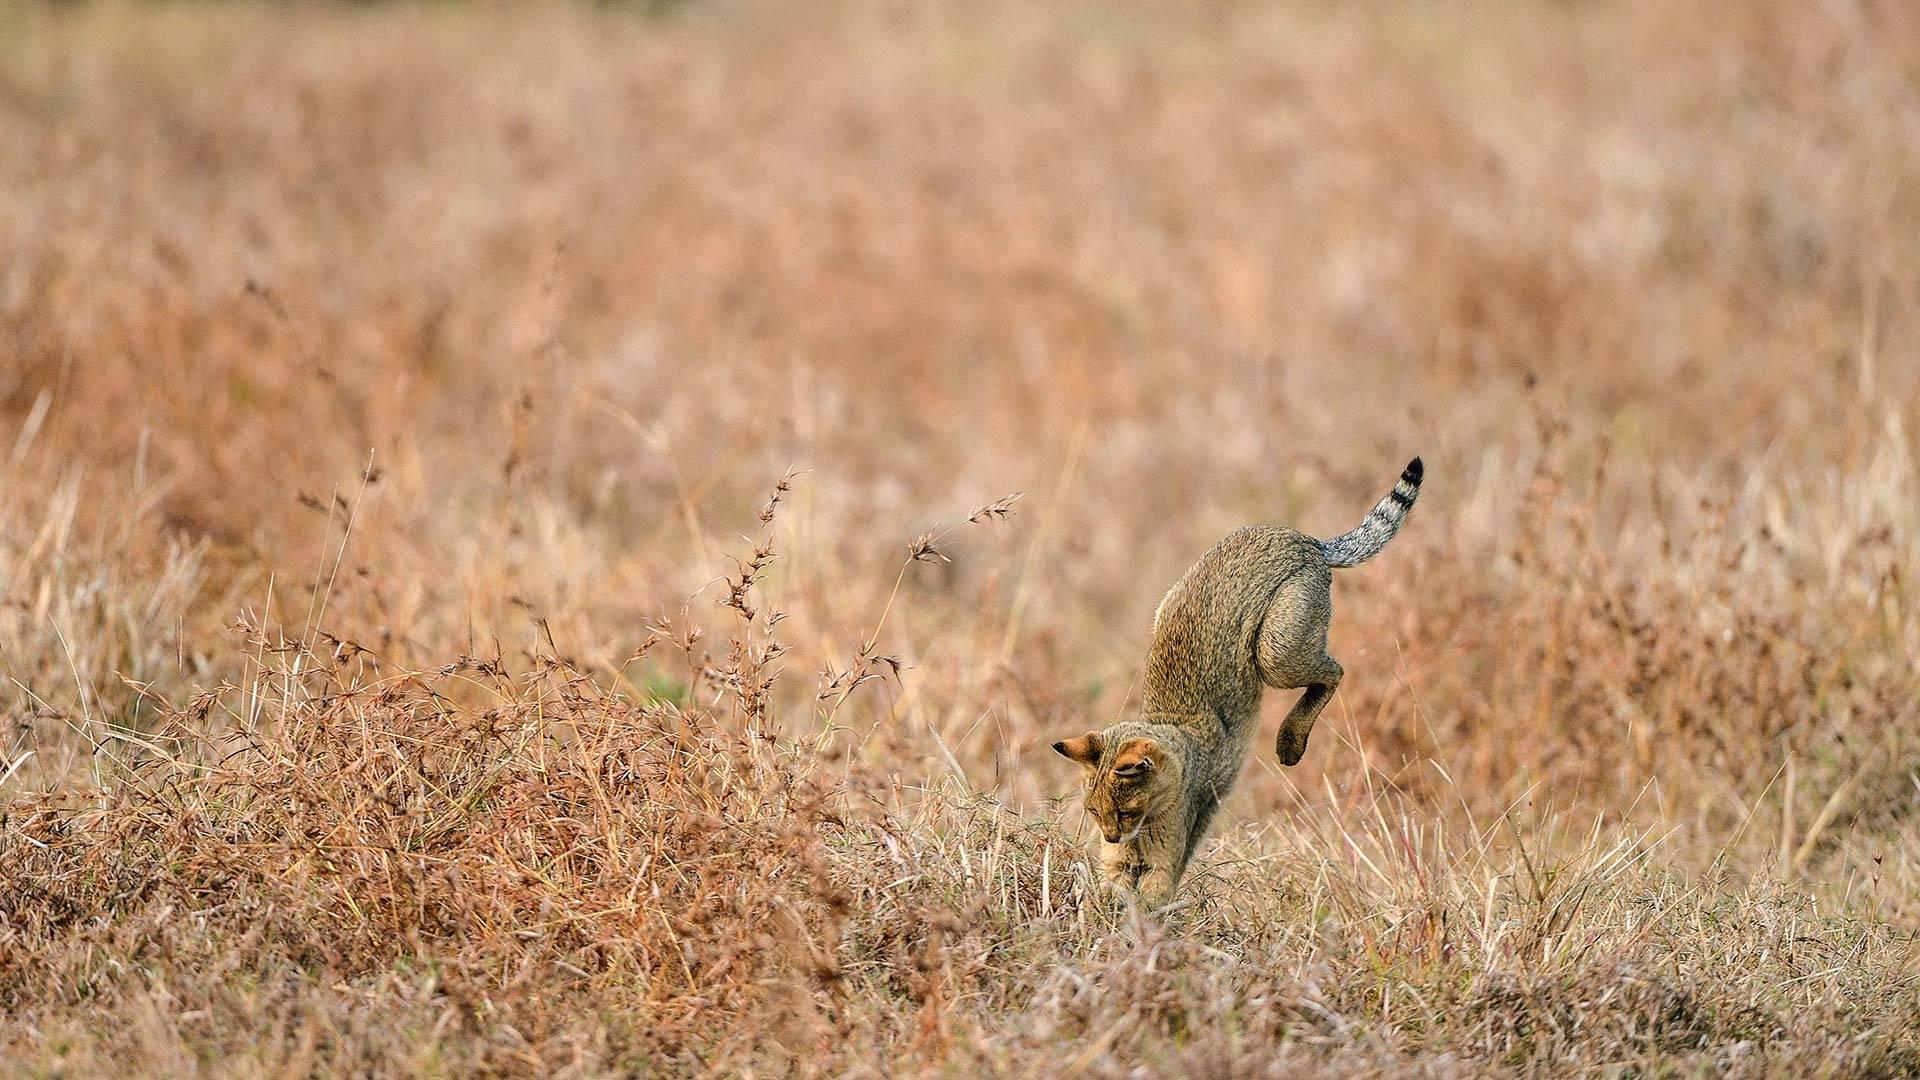 General 1920x1080 Bing photography nature cats hunt mammals animals hunting